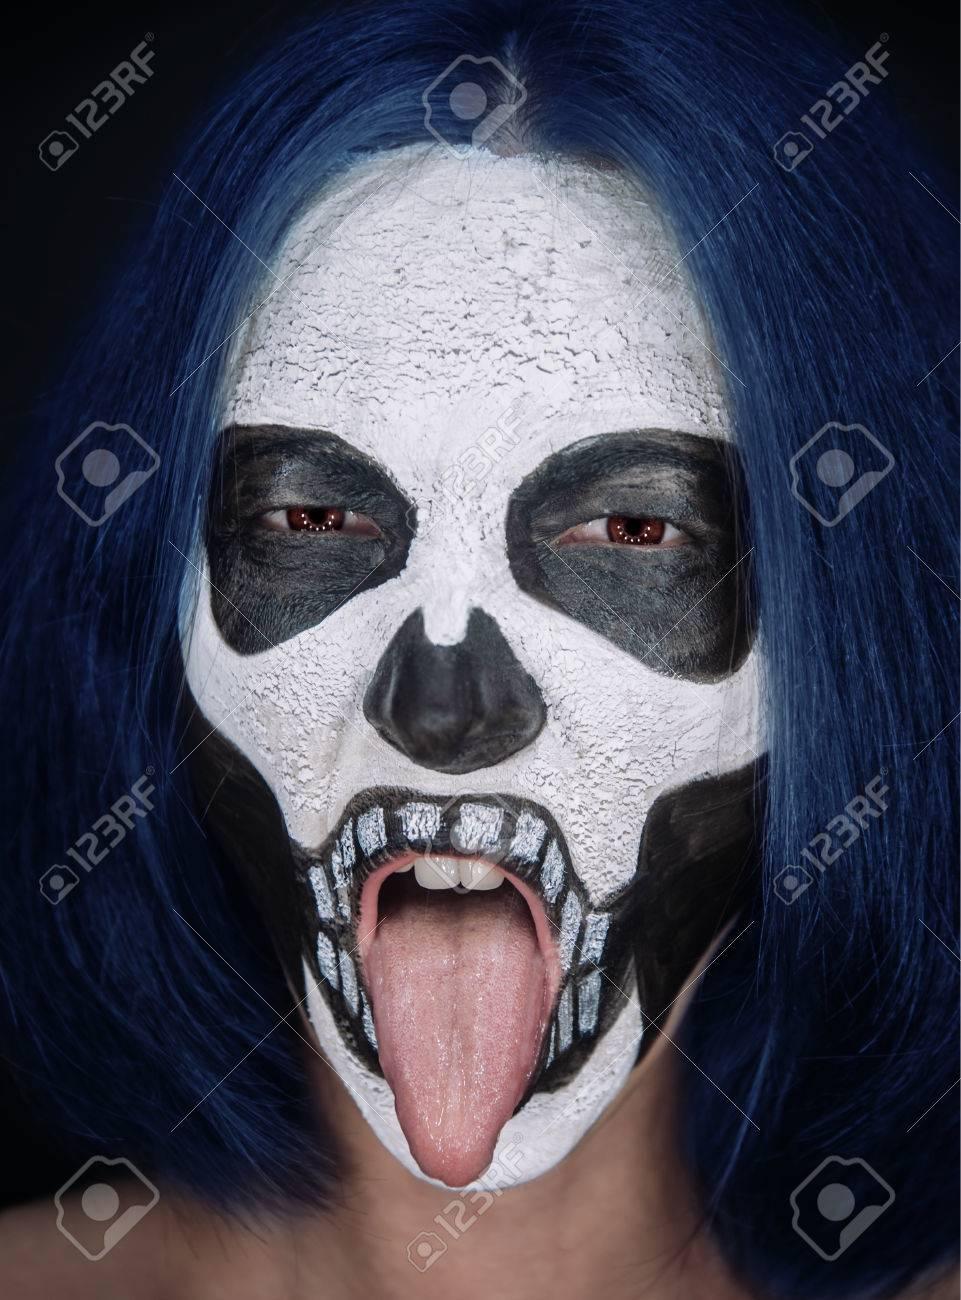 Maquillaje Terror Mujer Maquillaje Terror U Foto De Stock With